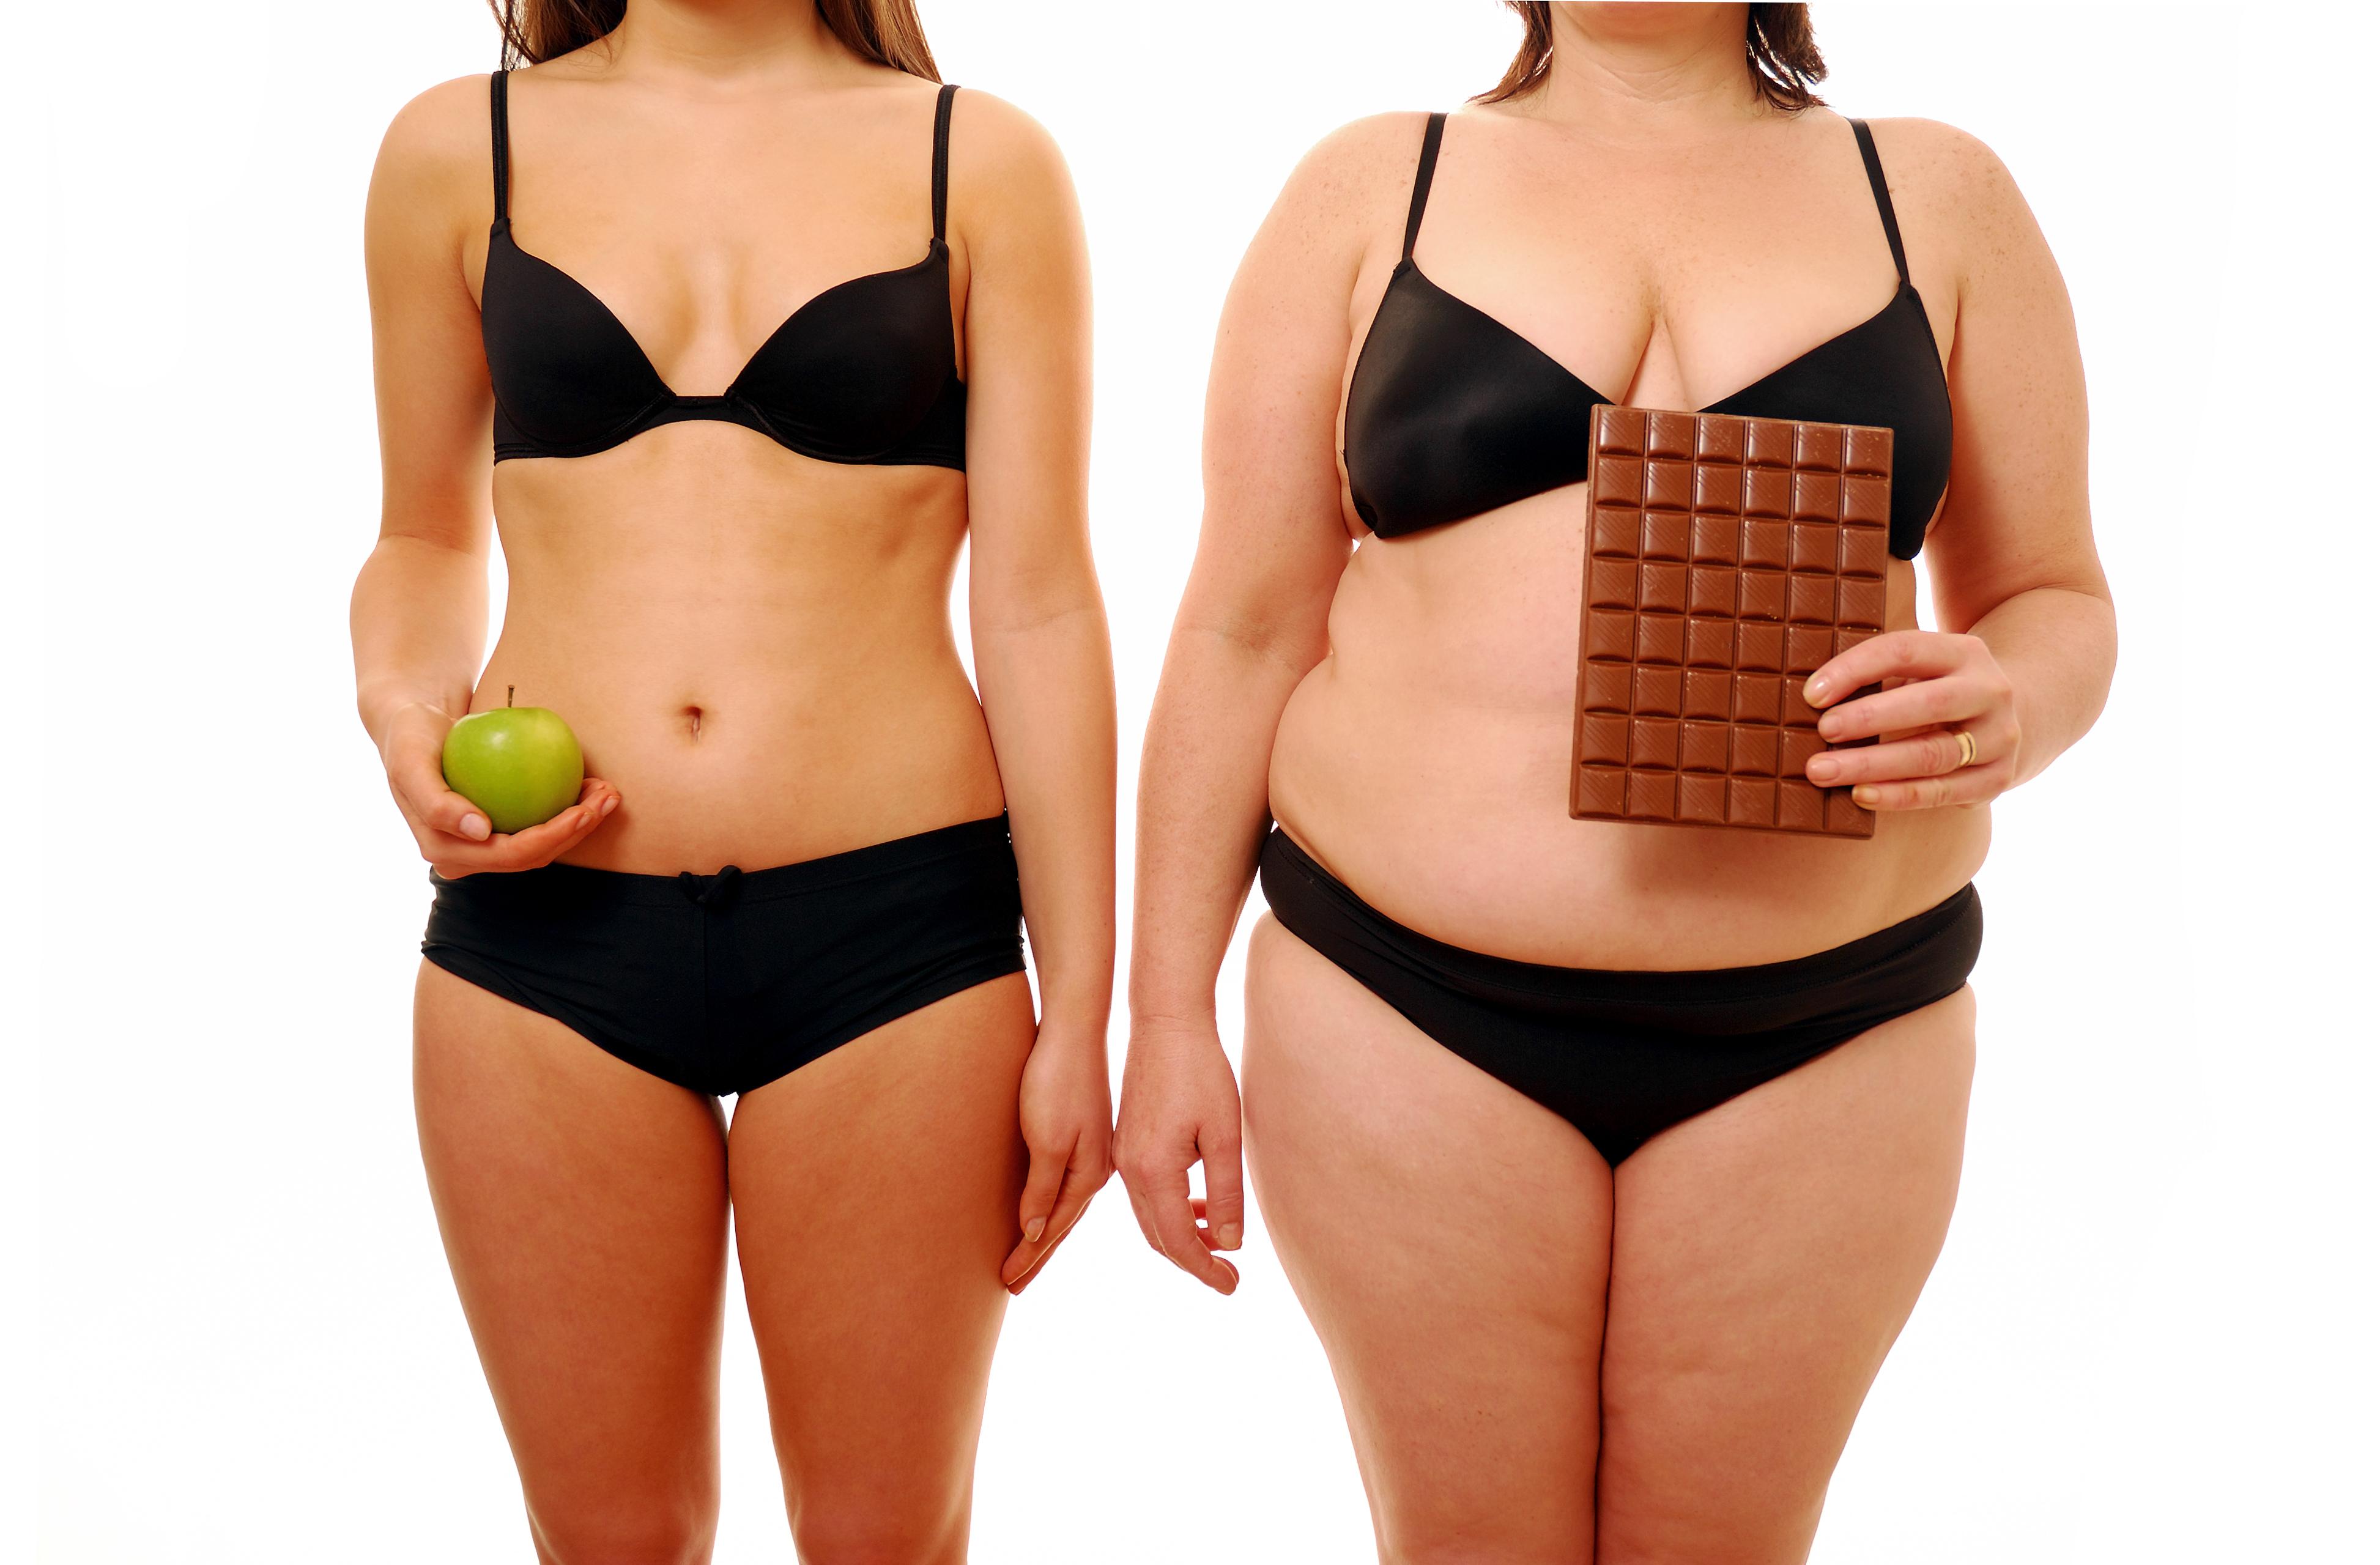 Despre metabolism sau cum sa pierzi in greutate inteligent